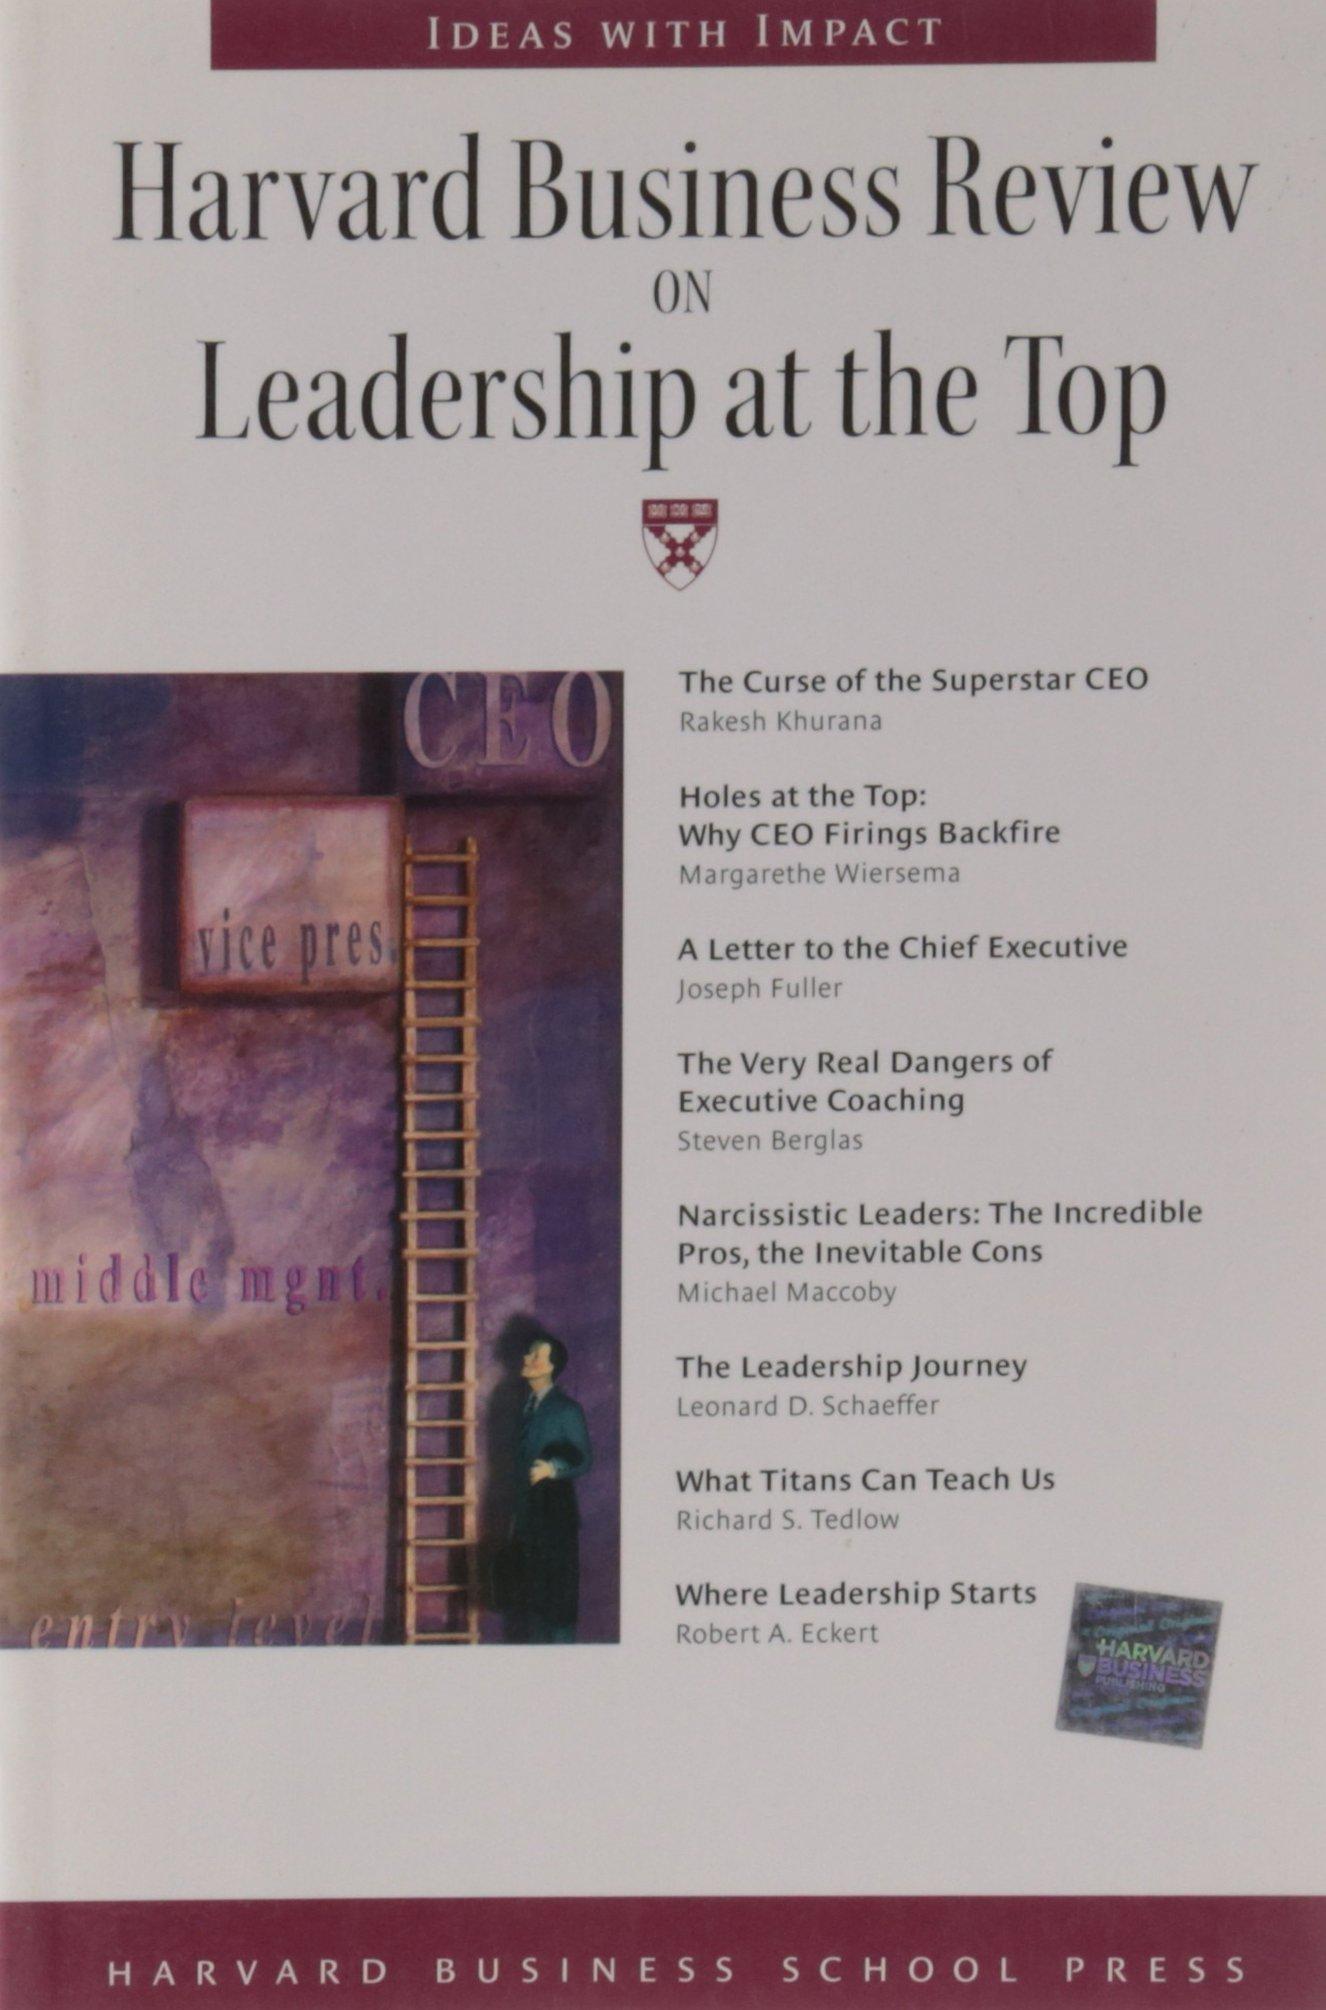 Download Harvard Business Review on Leadership at the Top (Harvard Business Review Paperback Series) ebook